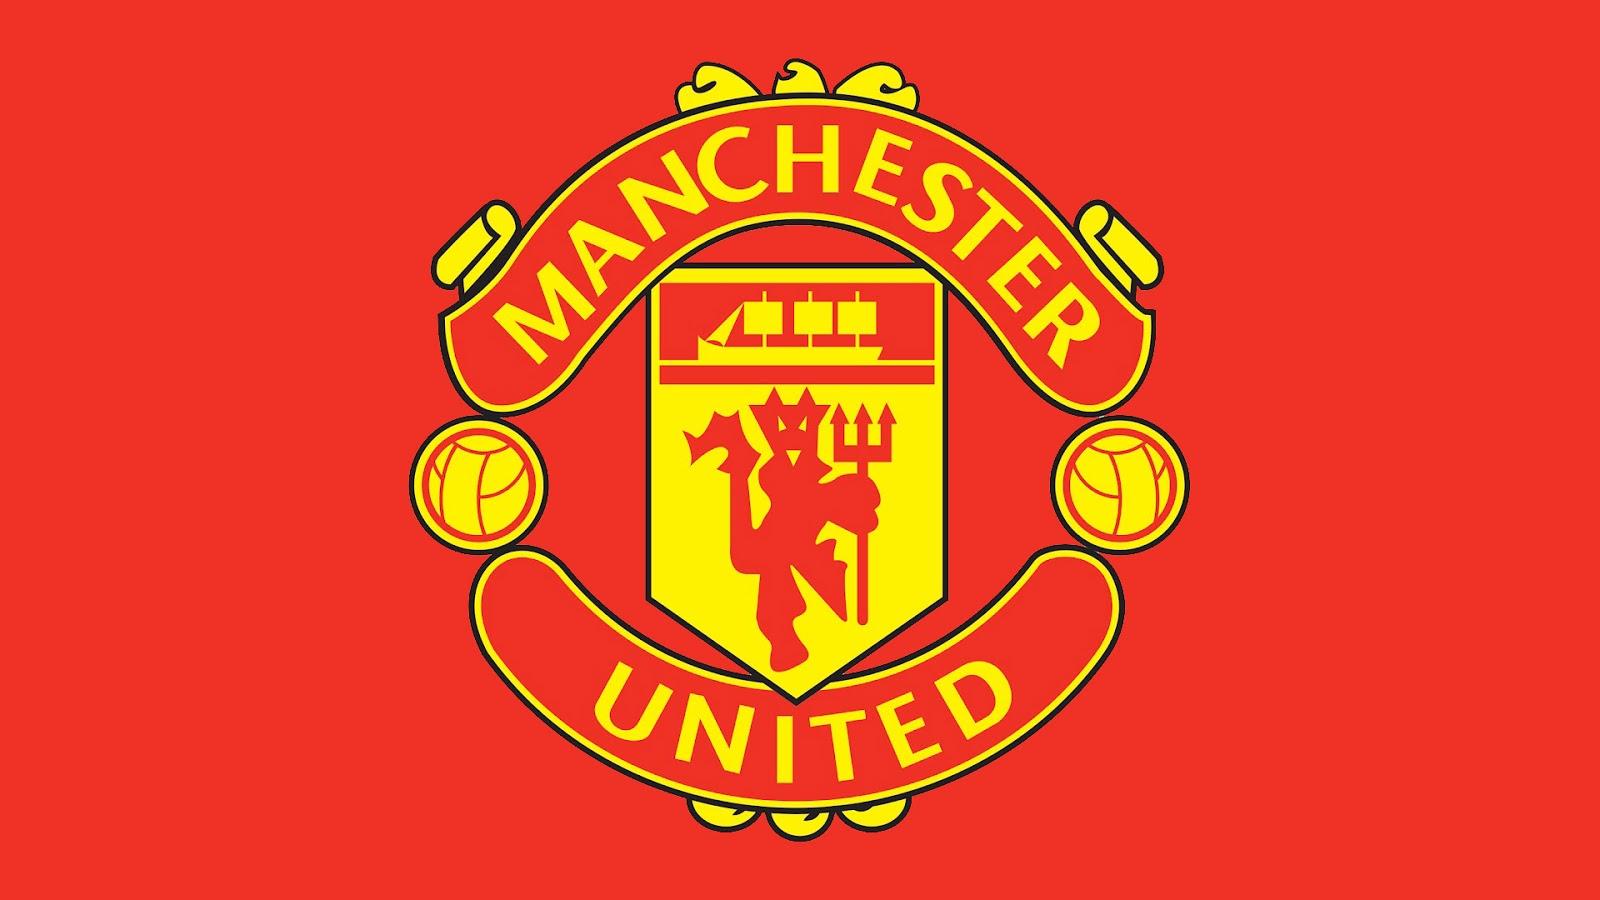 Jadwal Lengkap Pertandingan Manchester United Di Liga